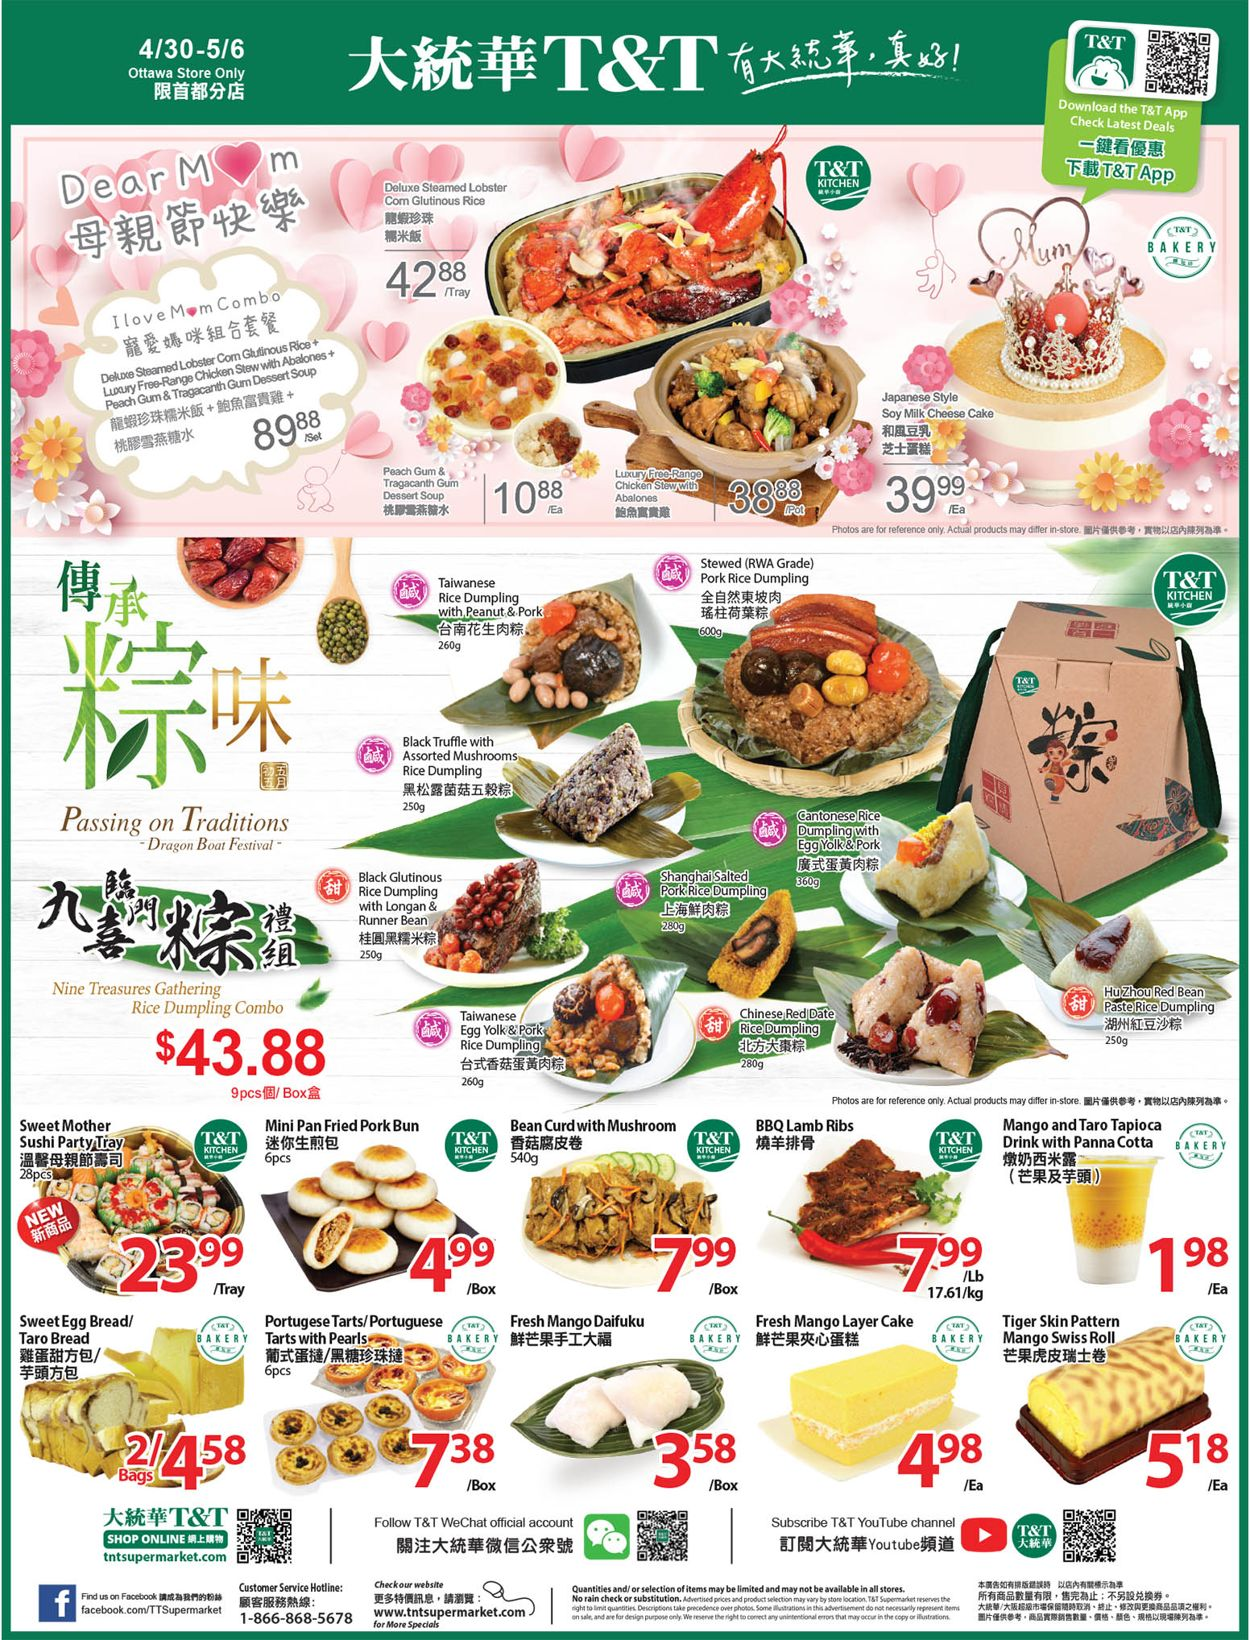 T&T Supermarket - Ottawa Flyer - 04/30-05/06/2021